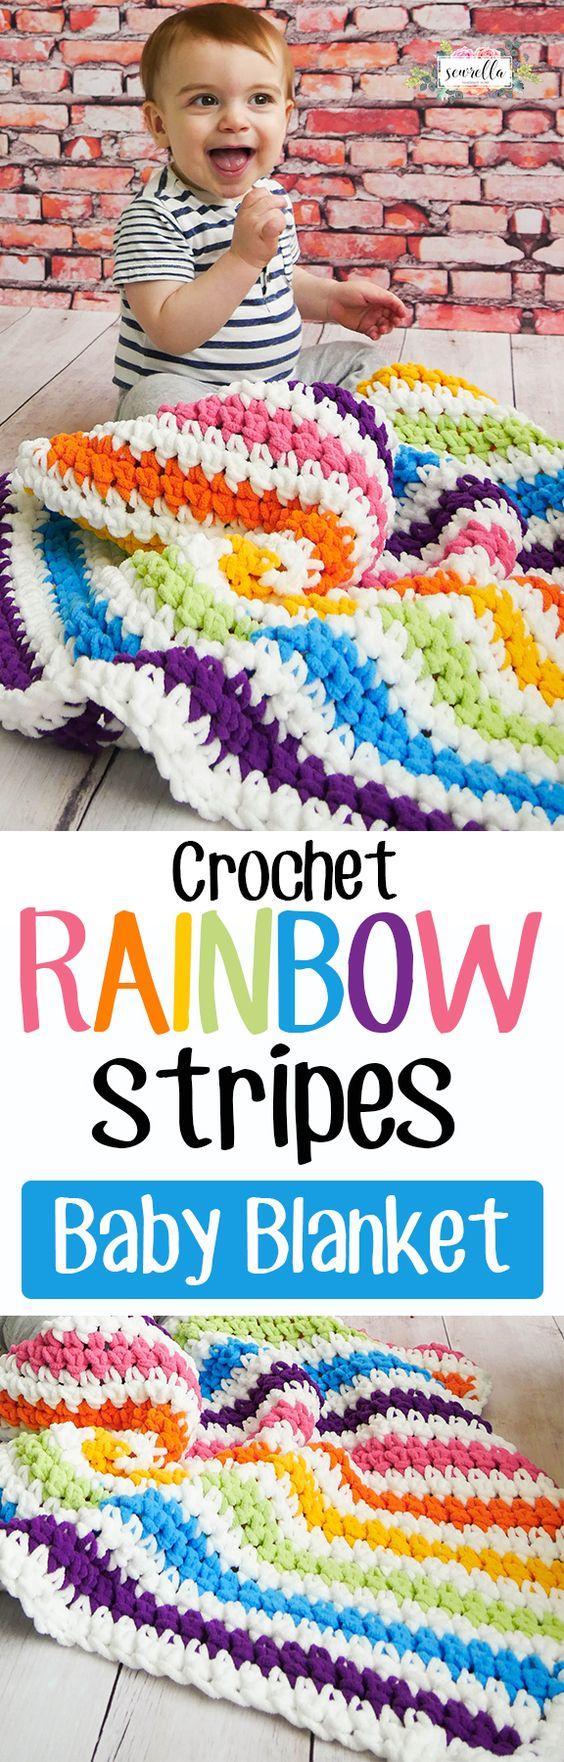 Crochet Rainbow Stripes Baby Blanket Free Pattern.